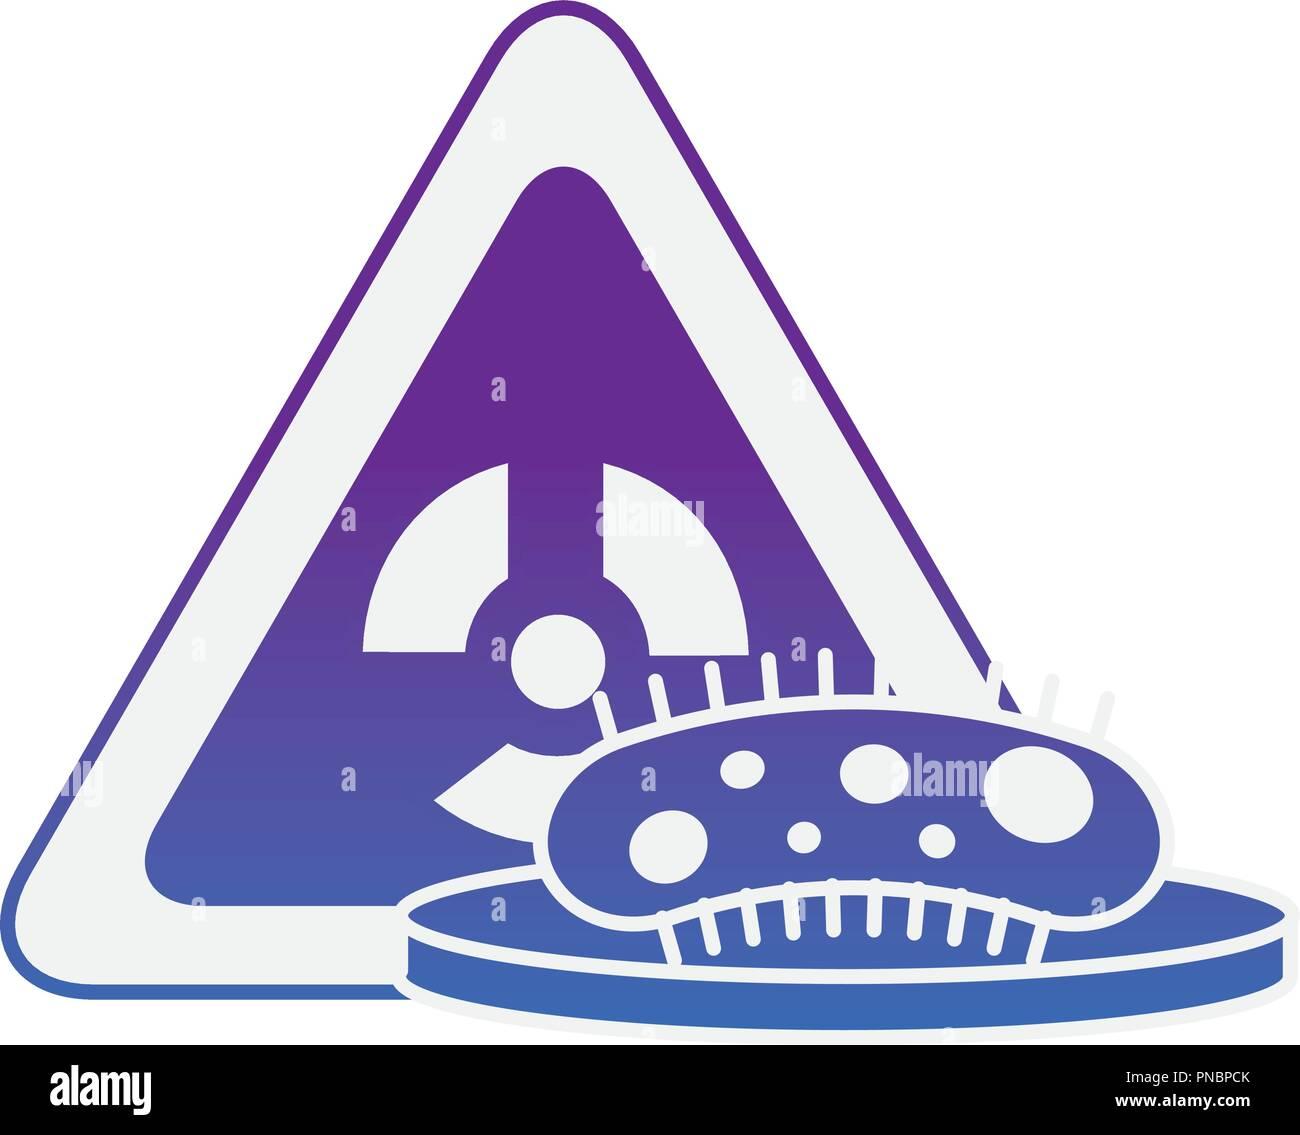 bacteria science hazard radiation danger - Stock Image